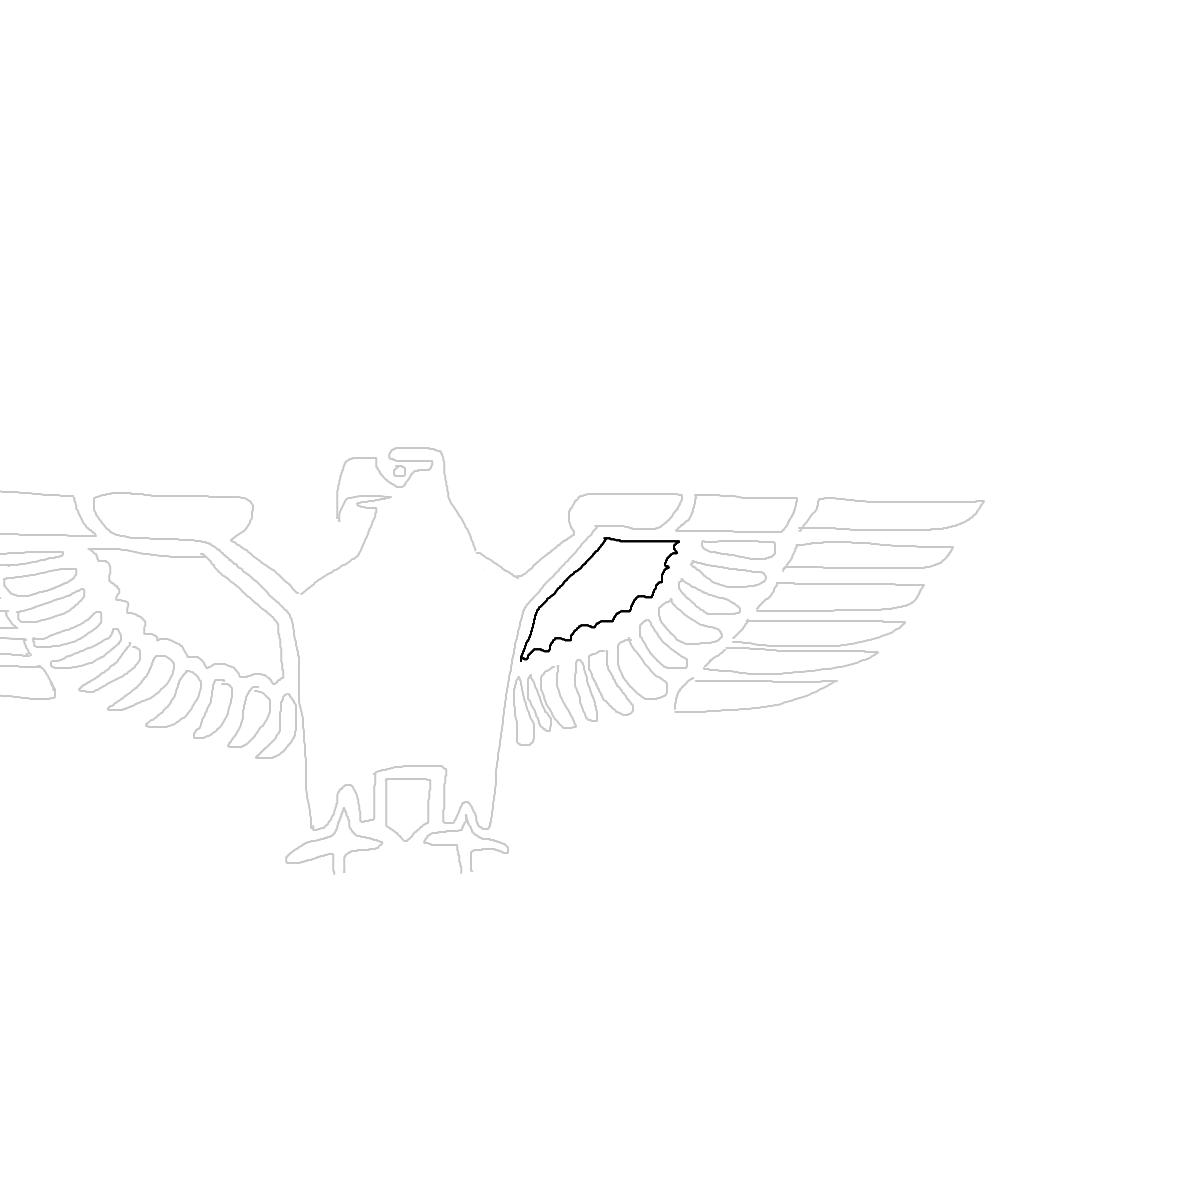 BAAAM drawing#19140 lat:60.3900756835937500lng: 25.6671066284179700